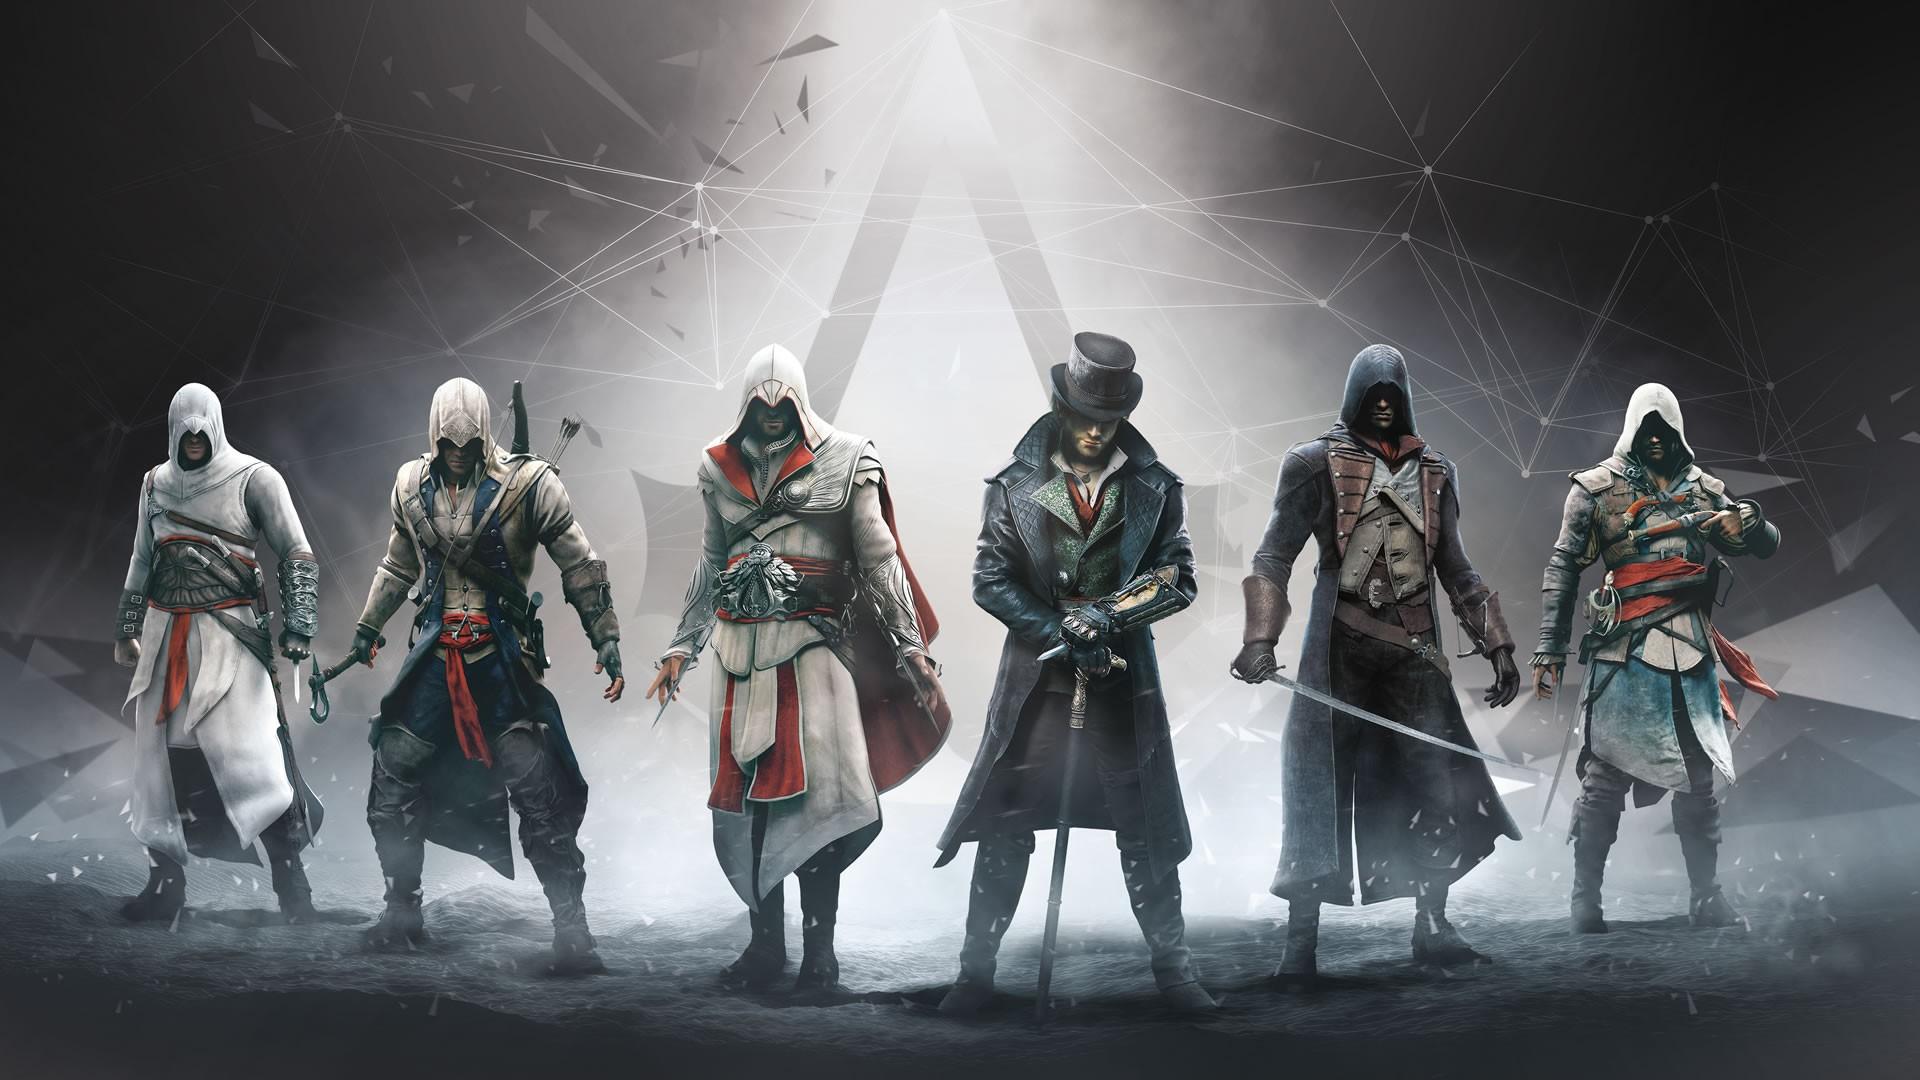 General 1920x1080 video games Assassin's Creed Syndicate Assassin's Creed Assassin's Creed: Brotherhood Assassin's Creed: Black Flag Altaïr Ibn-La'Ahad Edward Kenway